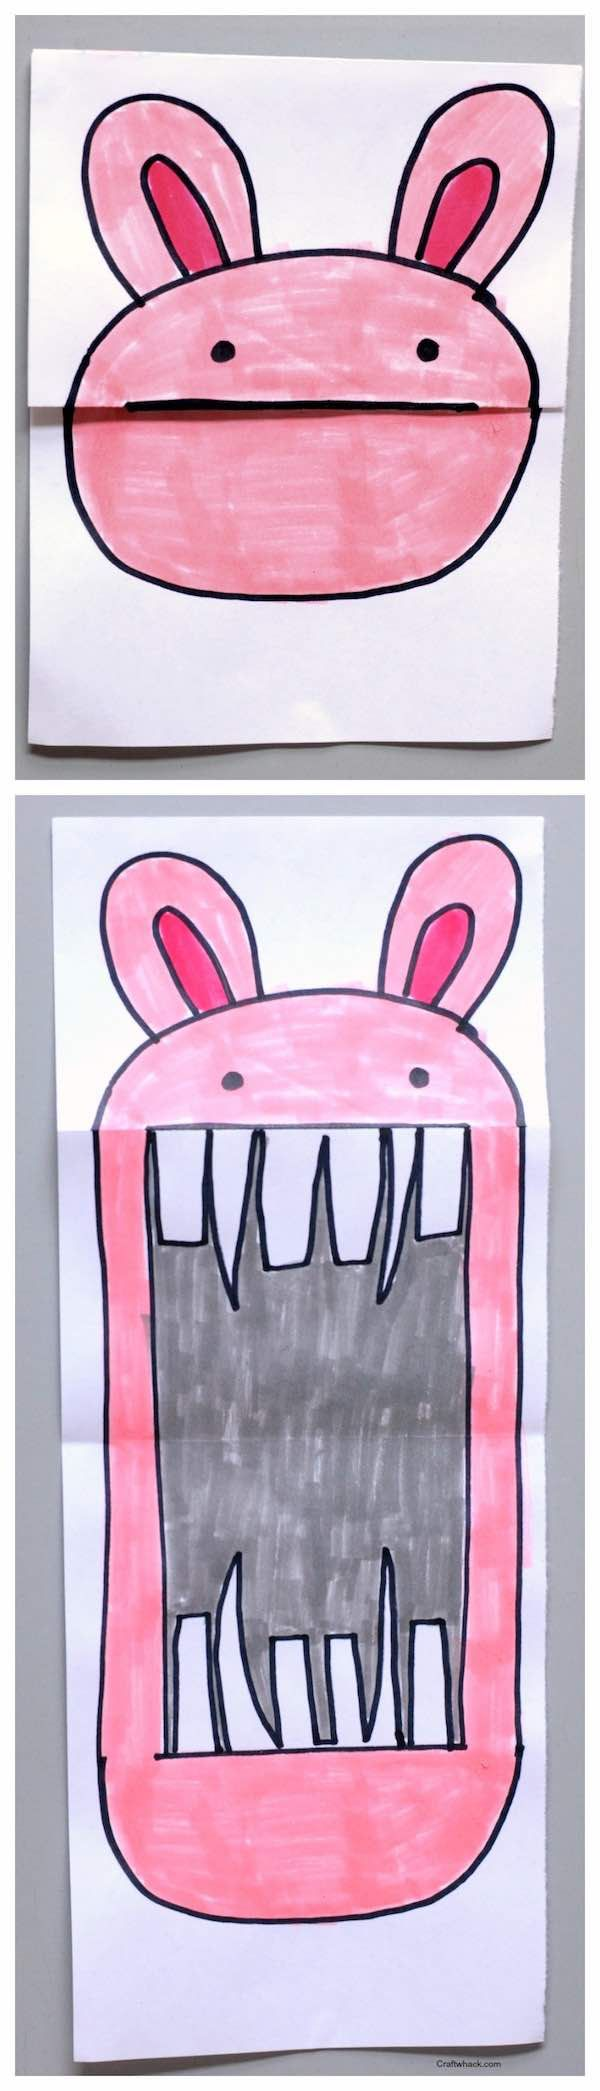 Surprise art for kids